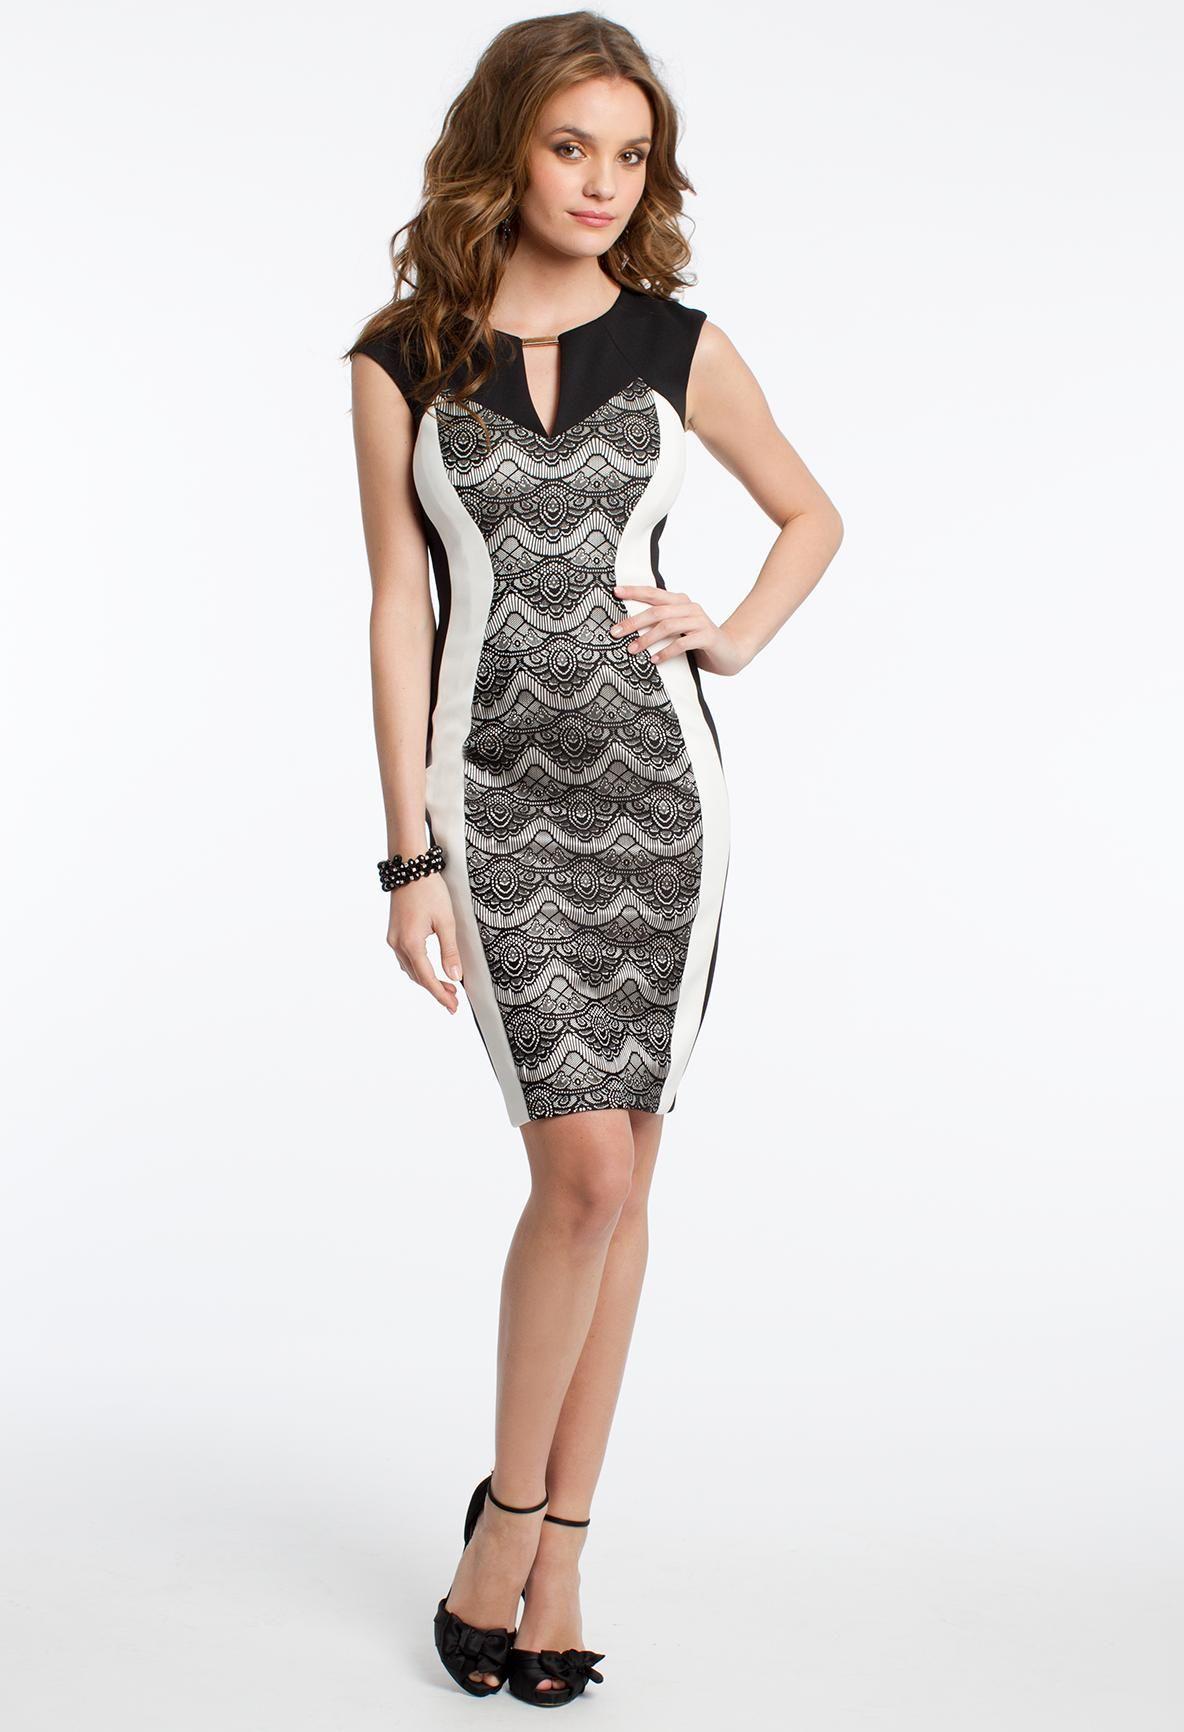 Lace and scuba dress prom dresses short pinterest scuba dress